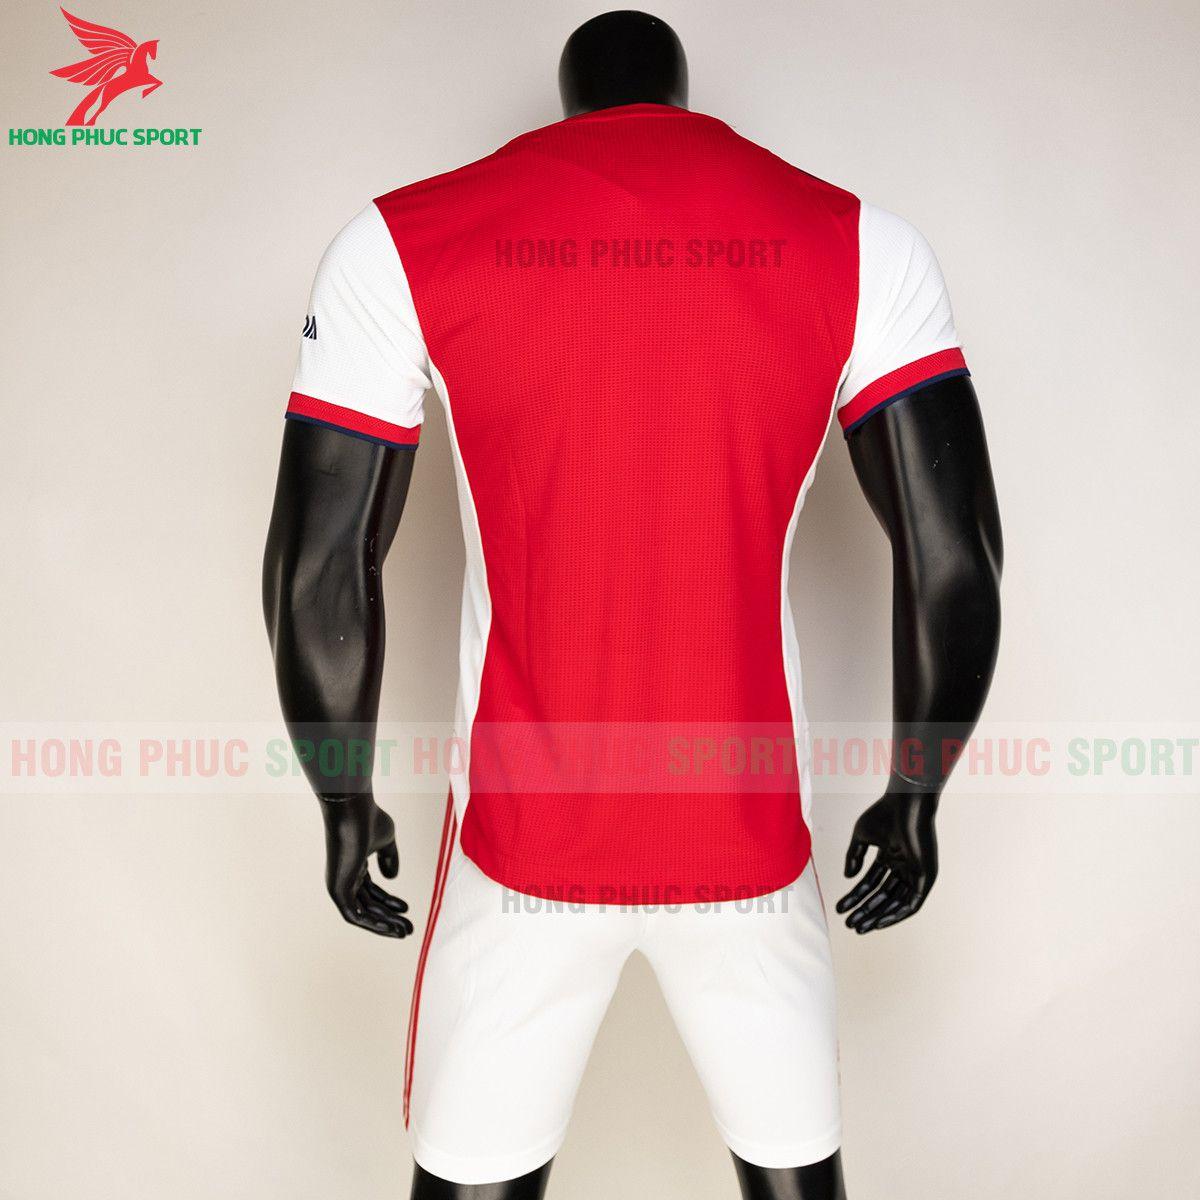 https://cdn.hongphucsport.com/unsafe/s4.shopbay.vn/files/285/ao-bong-da-arsenal-2021-22-san-nha-thailand-6155860183750.jpg